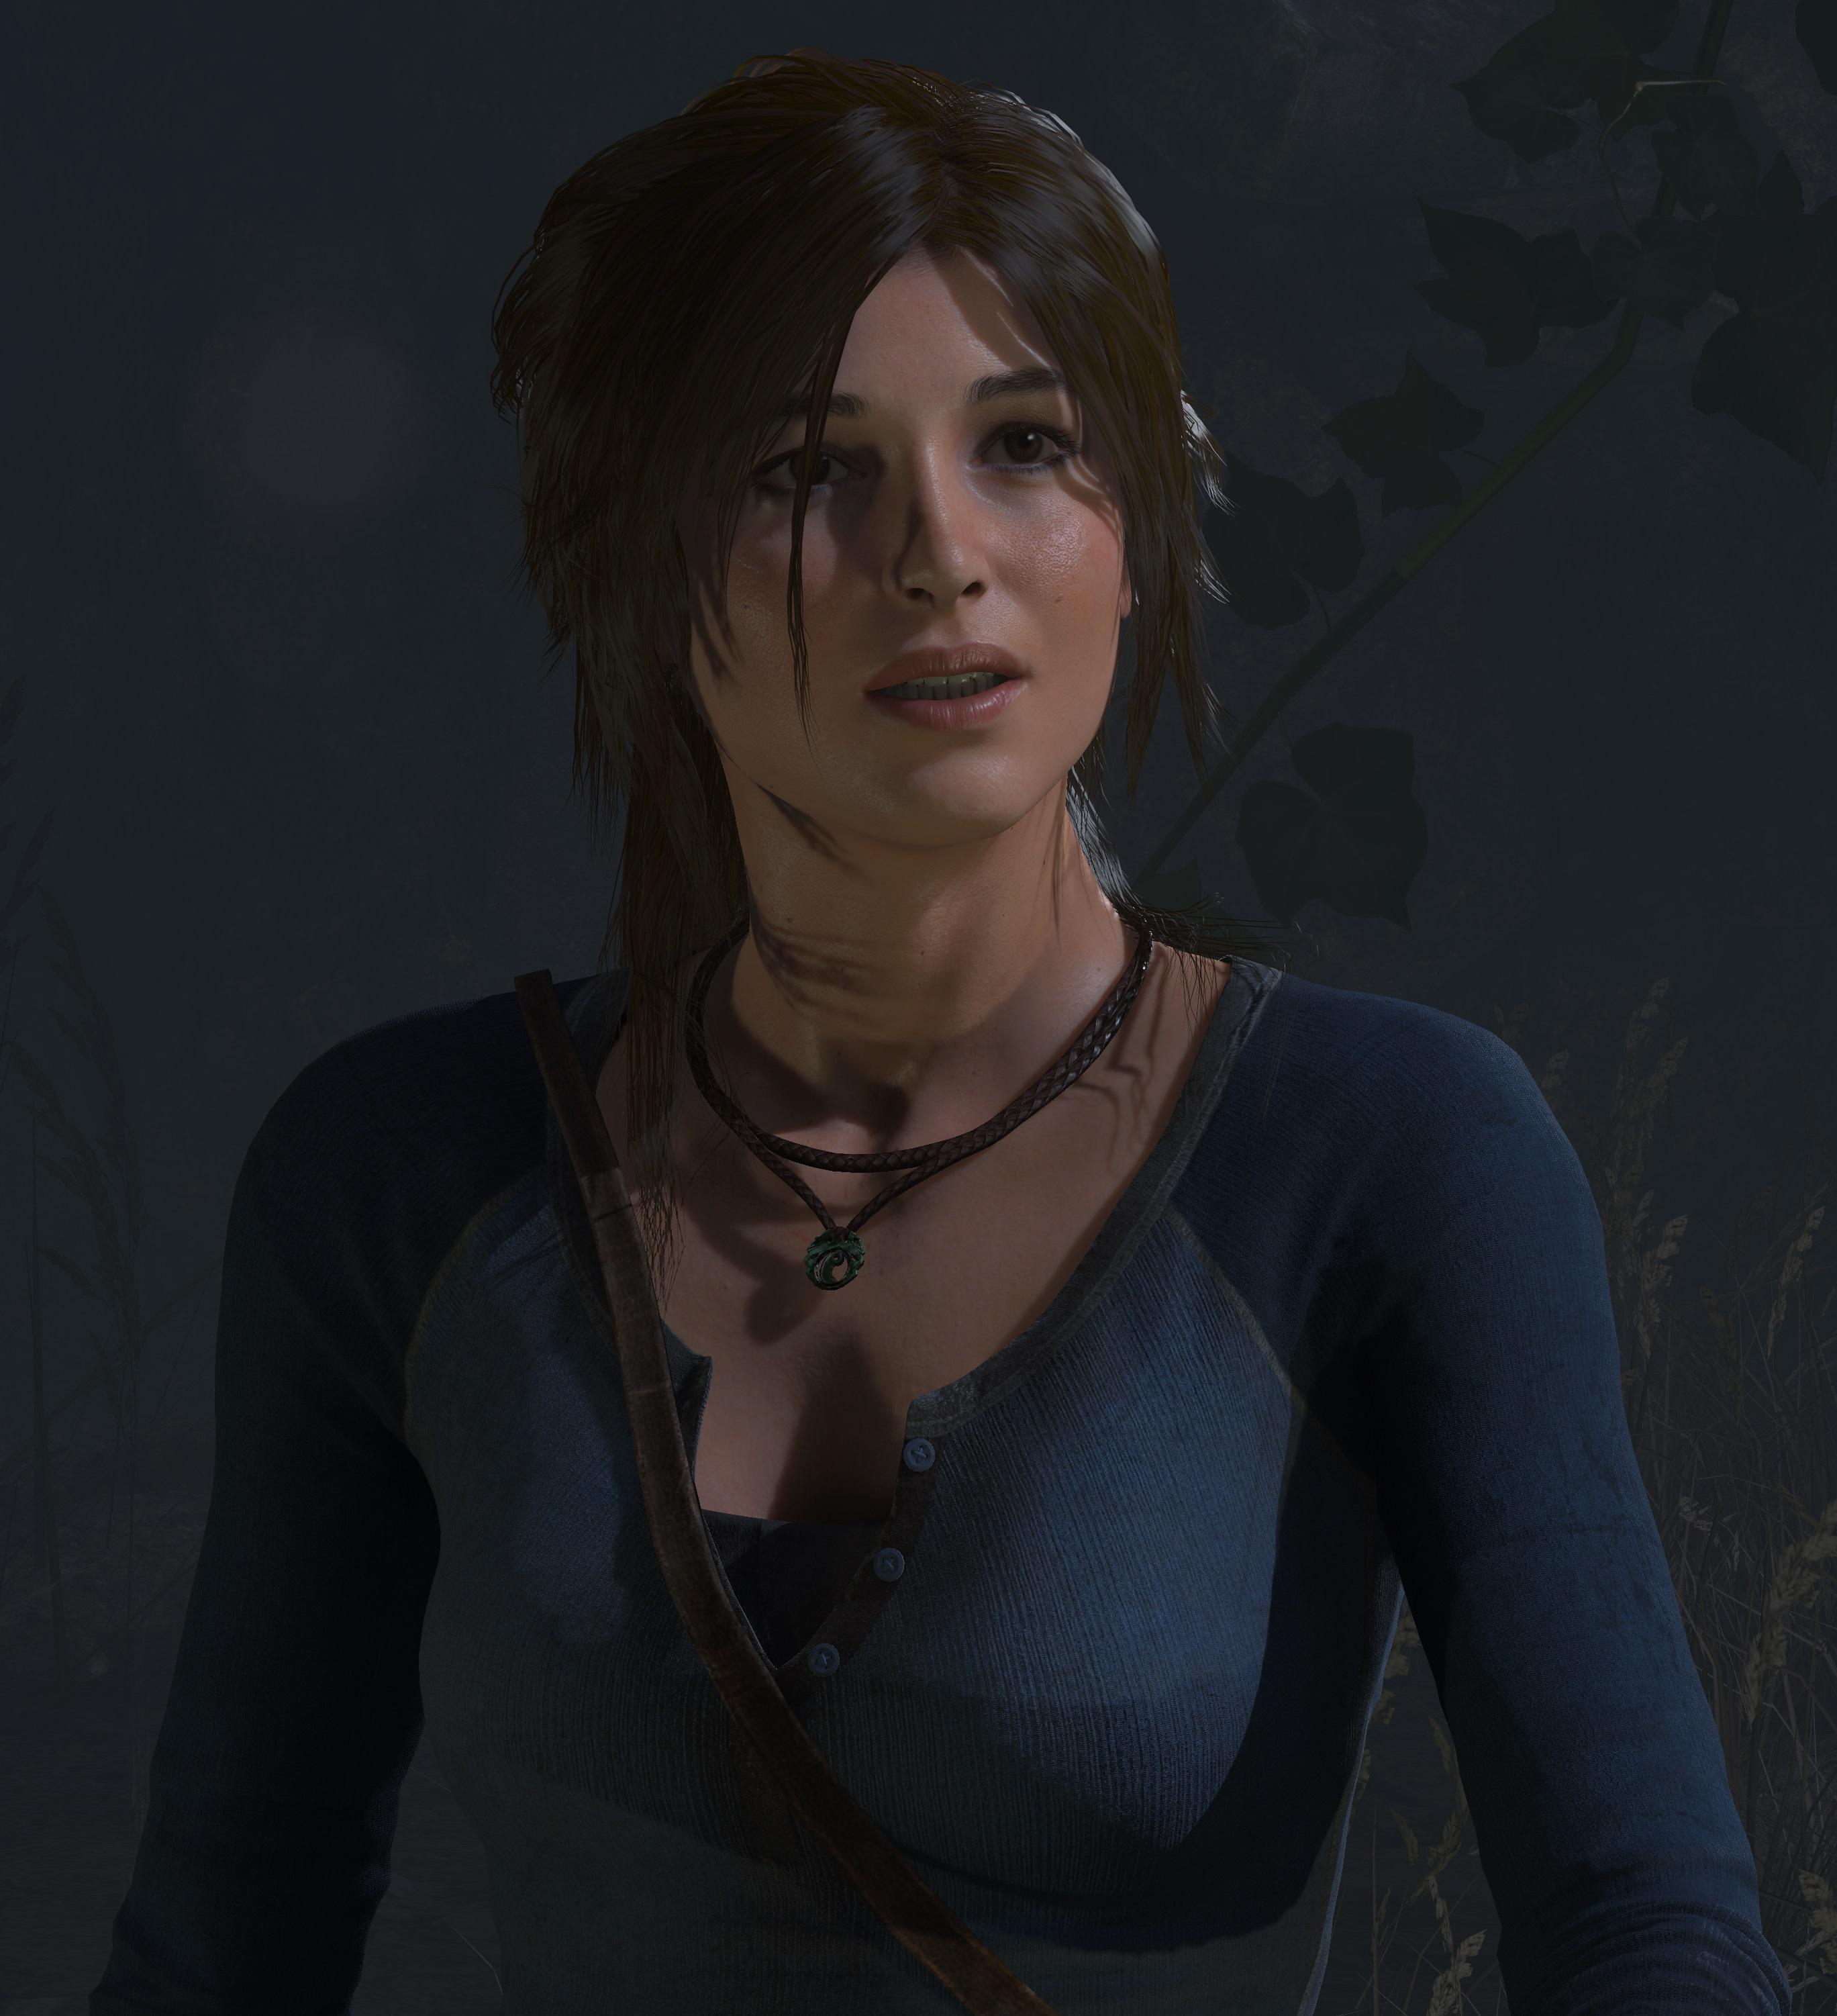 Rise of the Tomb Raider - Rise of the Tomb Raider 2K